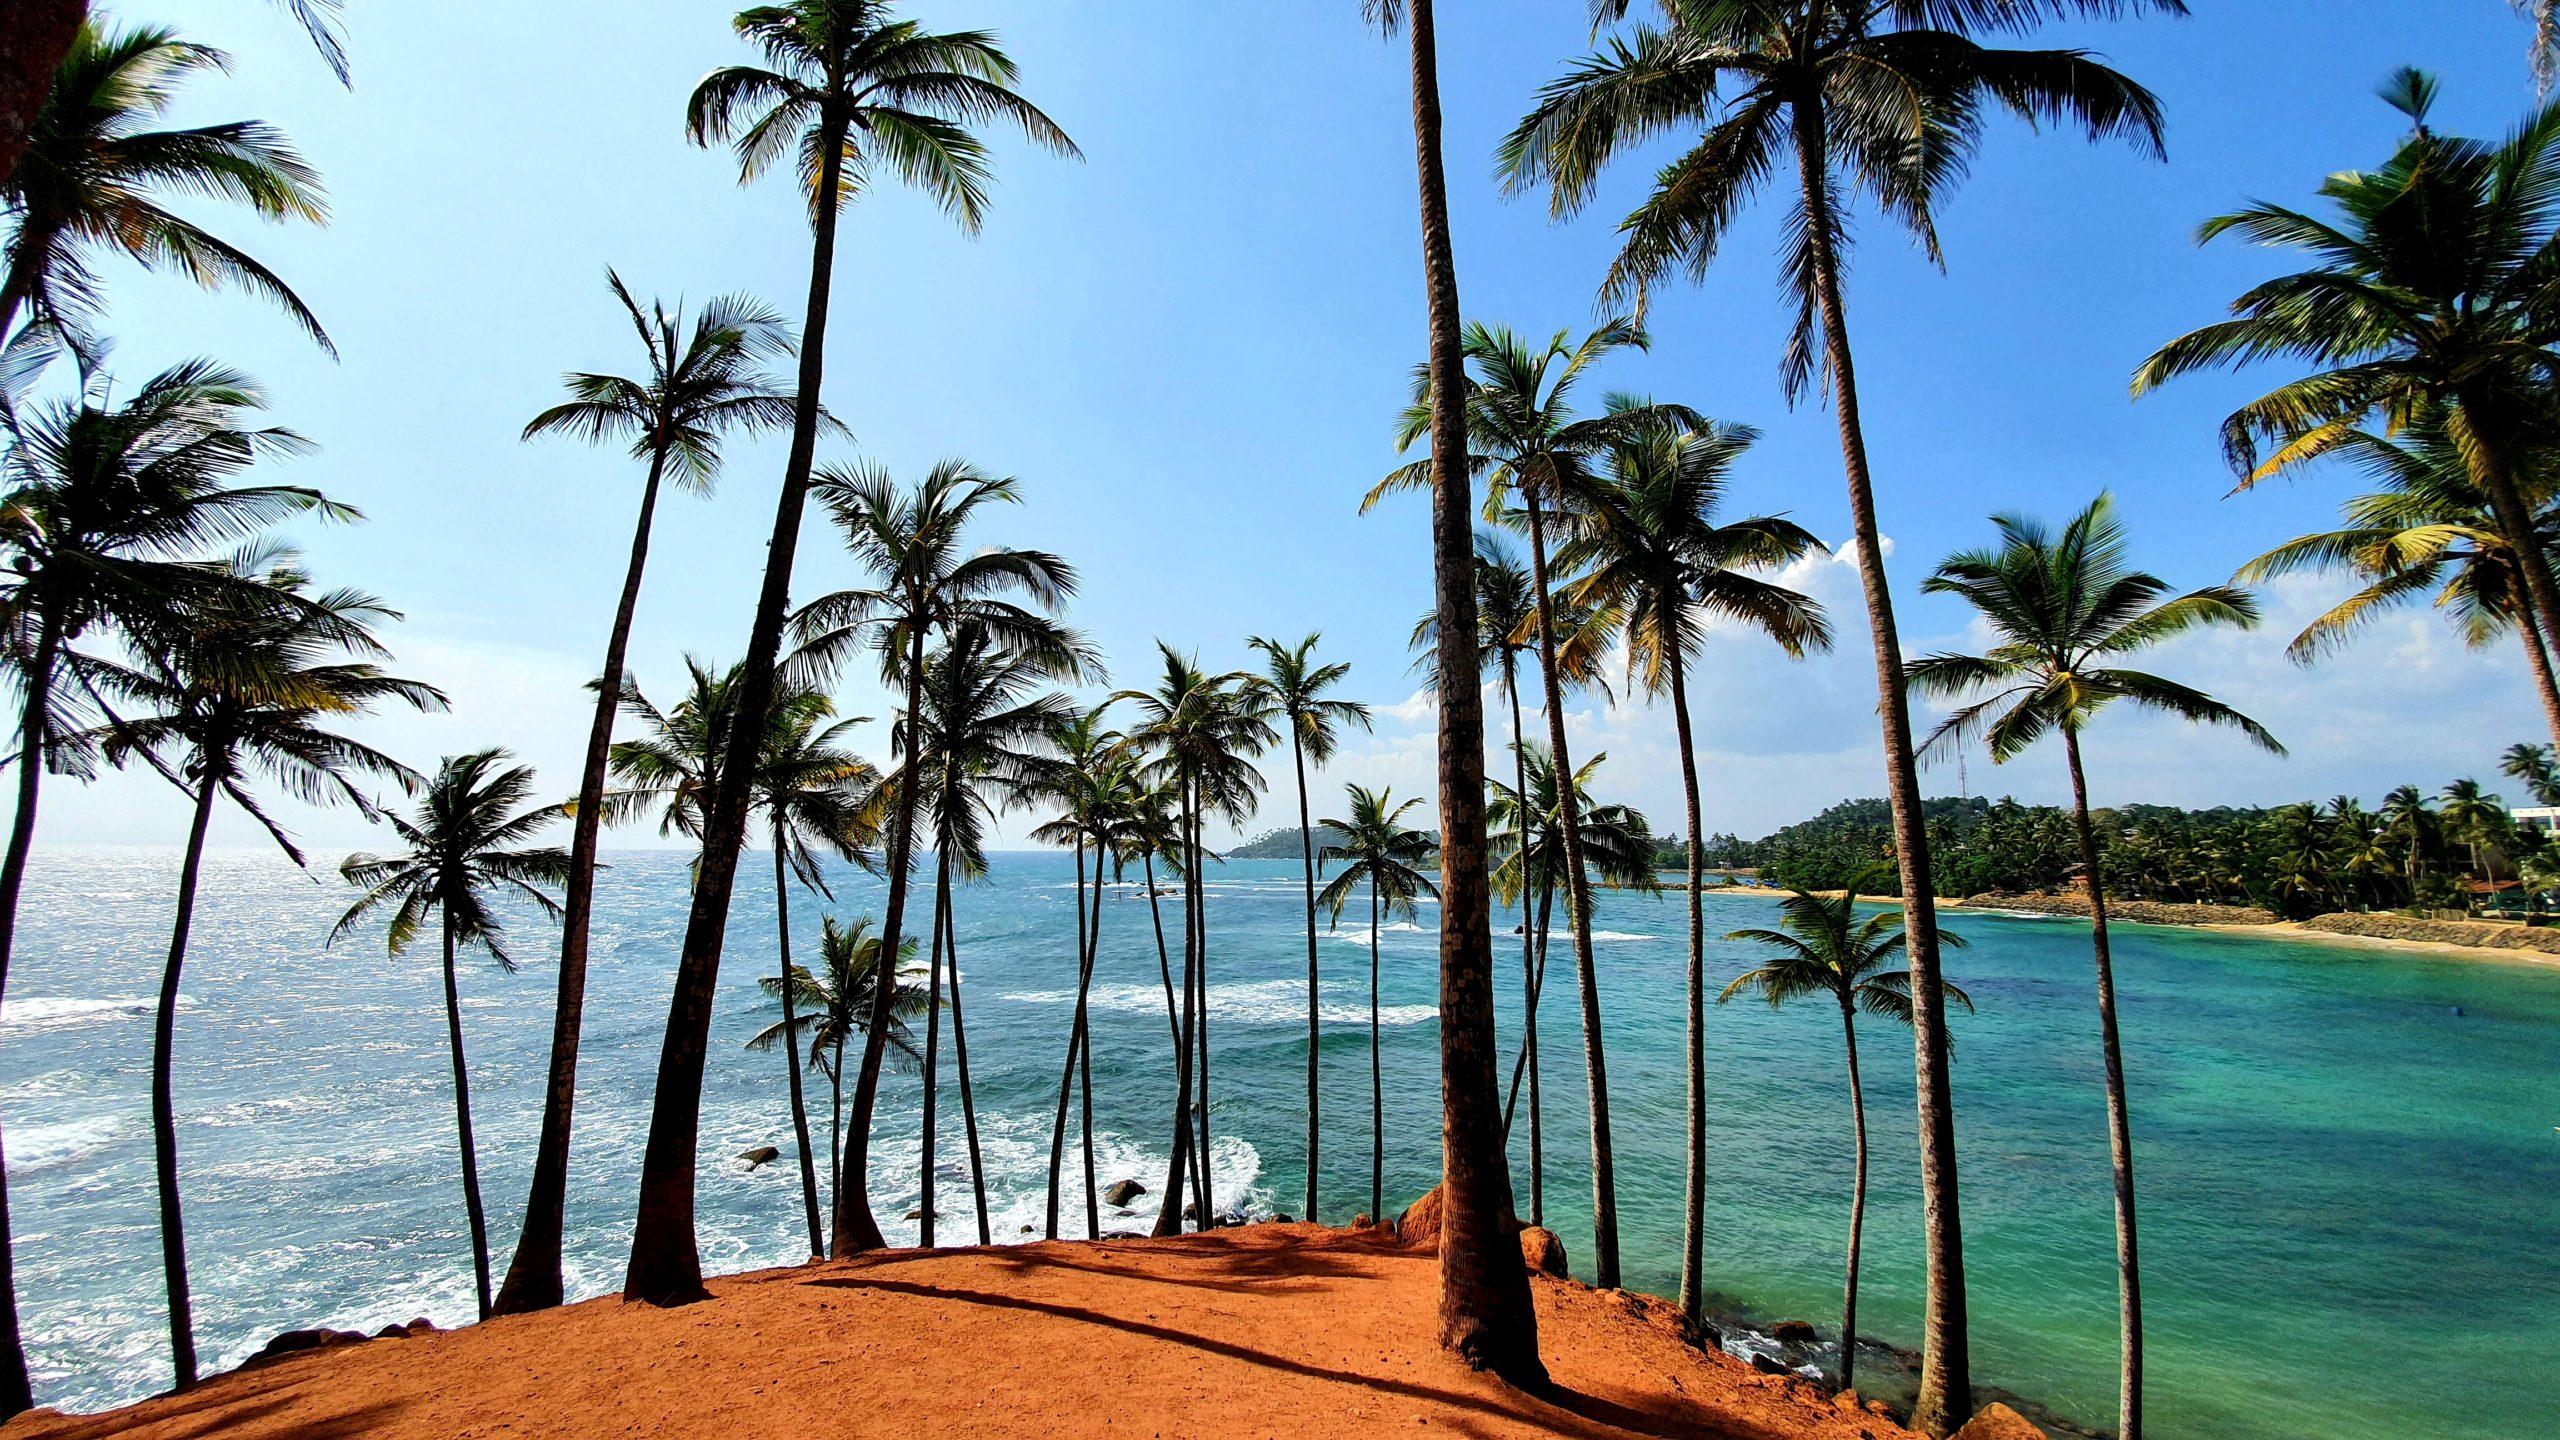 Coconut Tree Hill Sri Lanka must see places